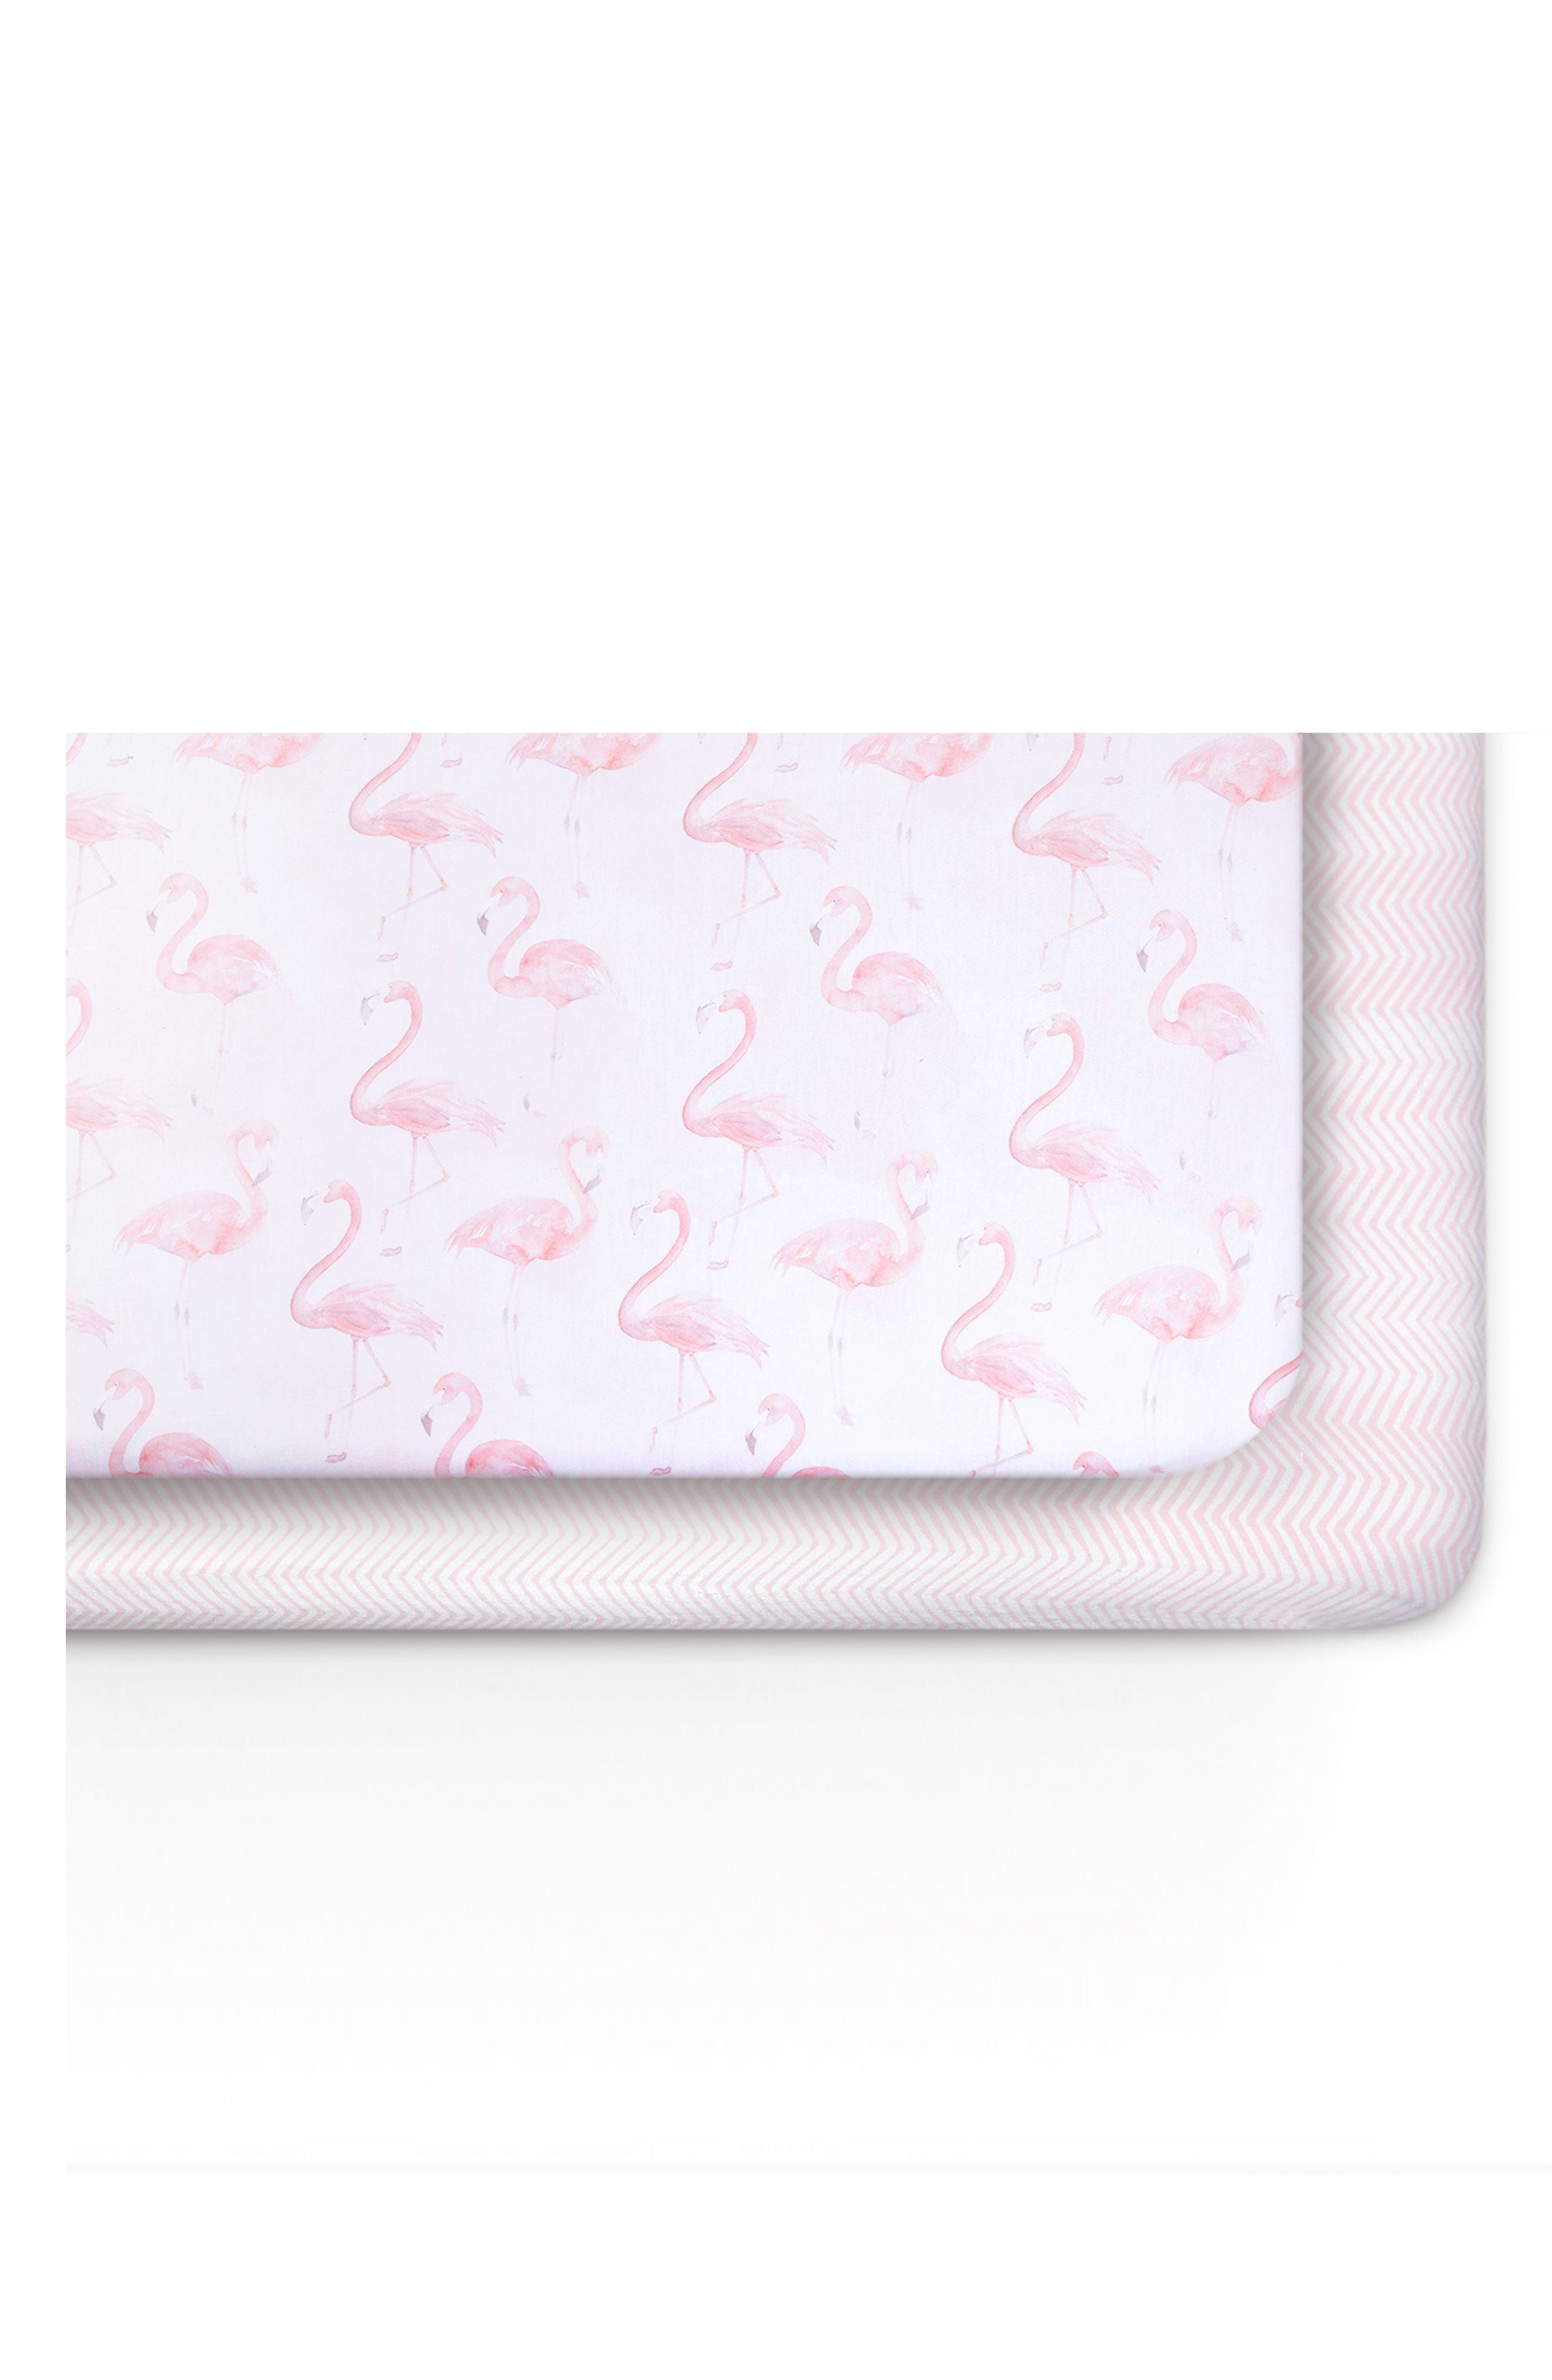 Flamingo & Zig-Zag 2-Pack Jersey Crib Sheets,                         Main,                         color, Flamingo